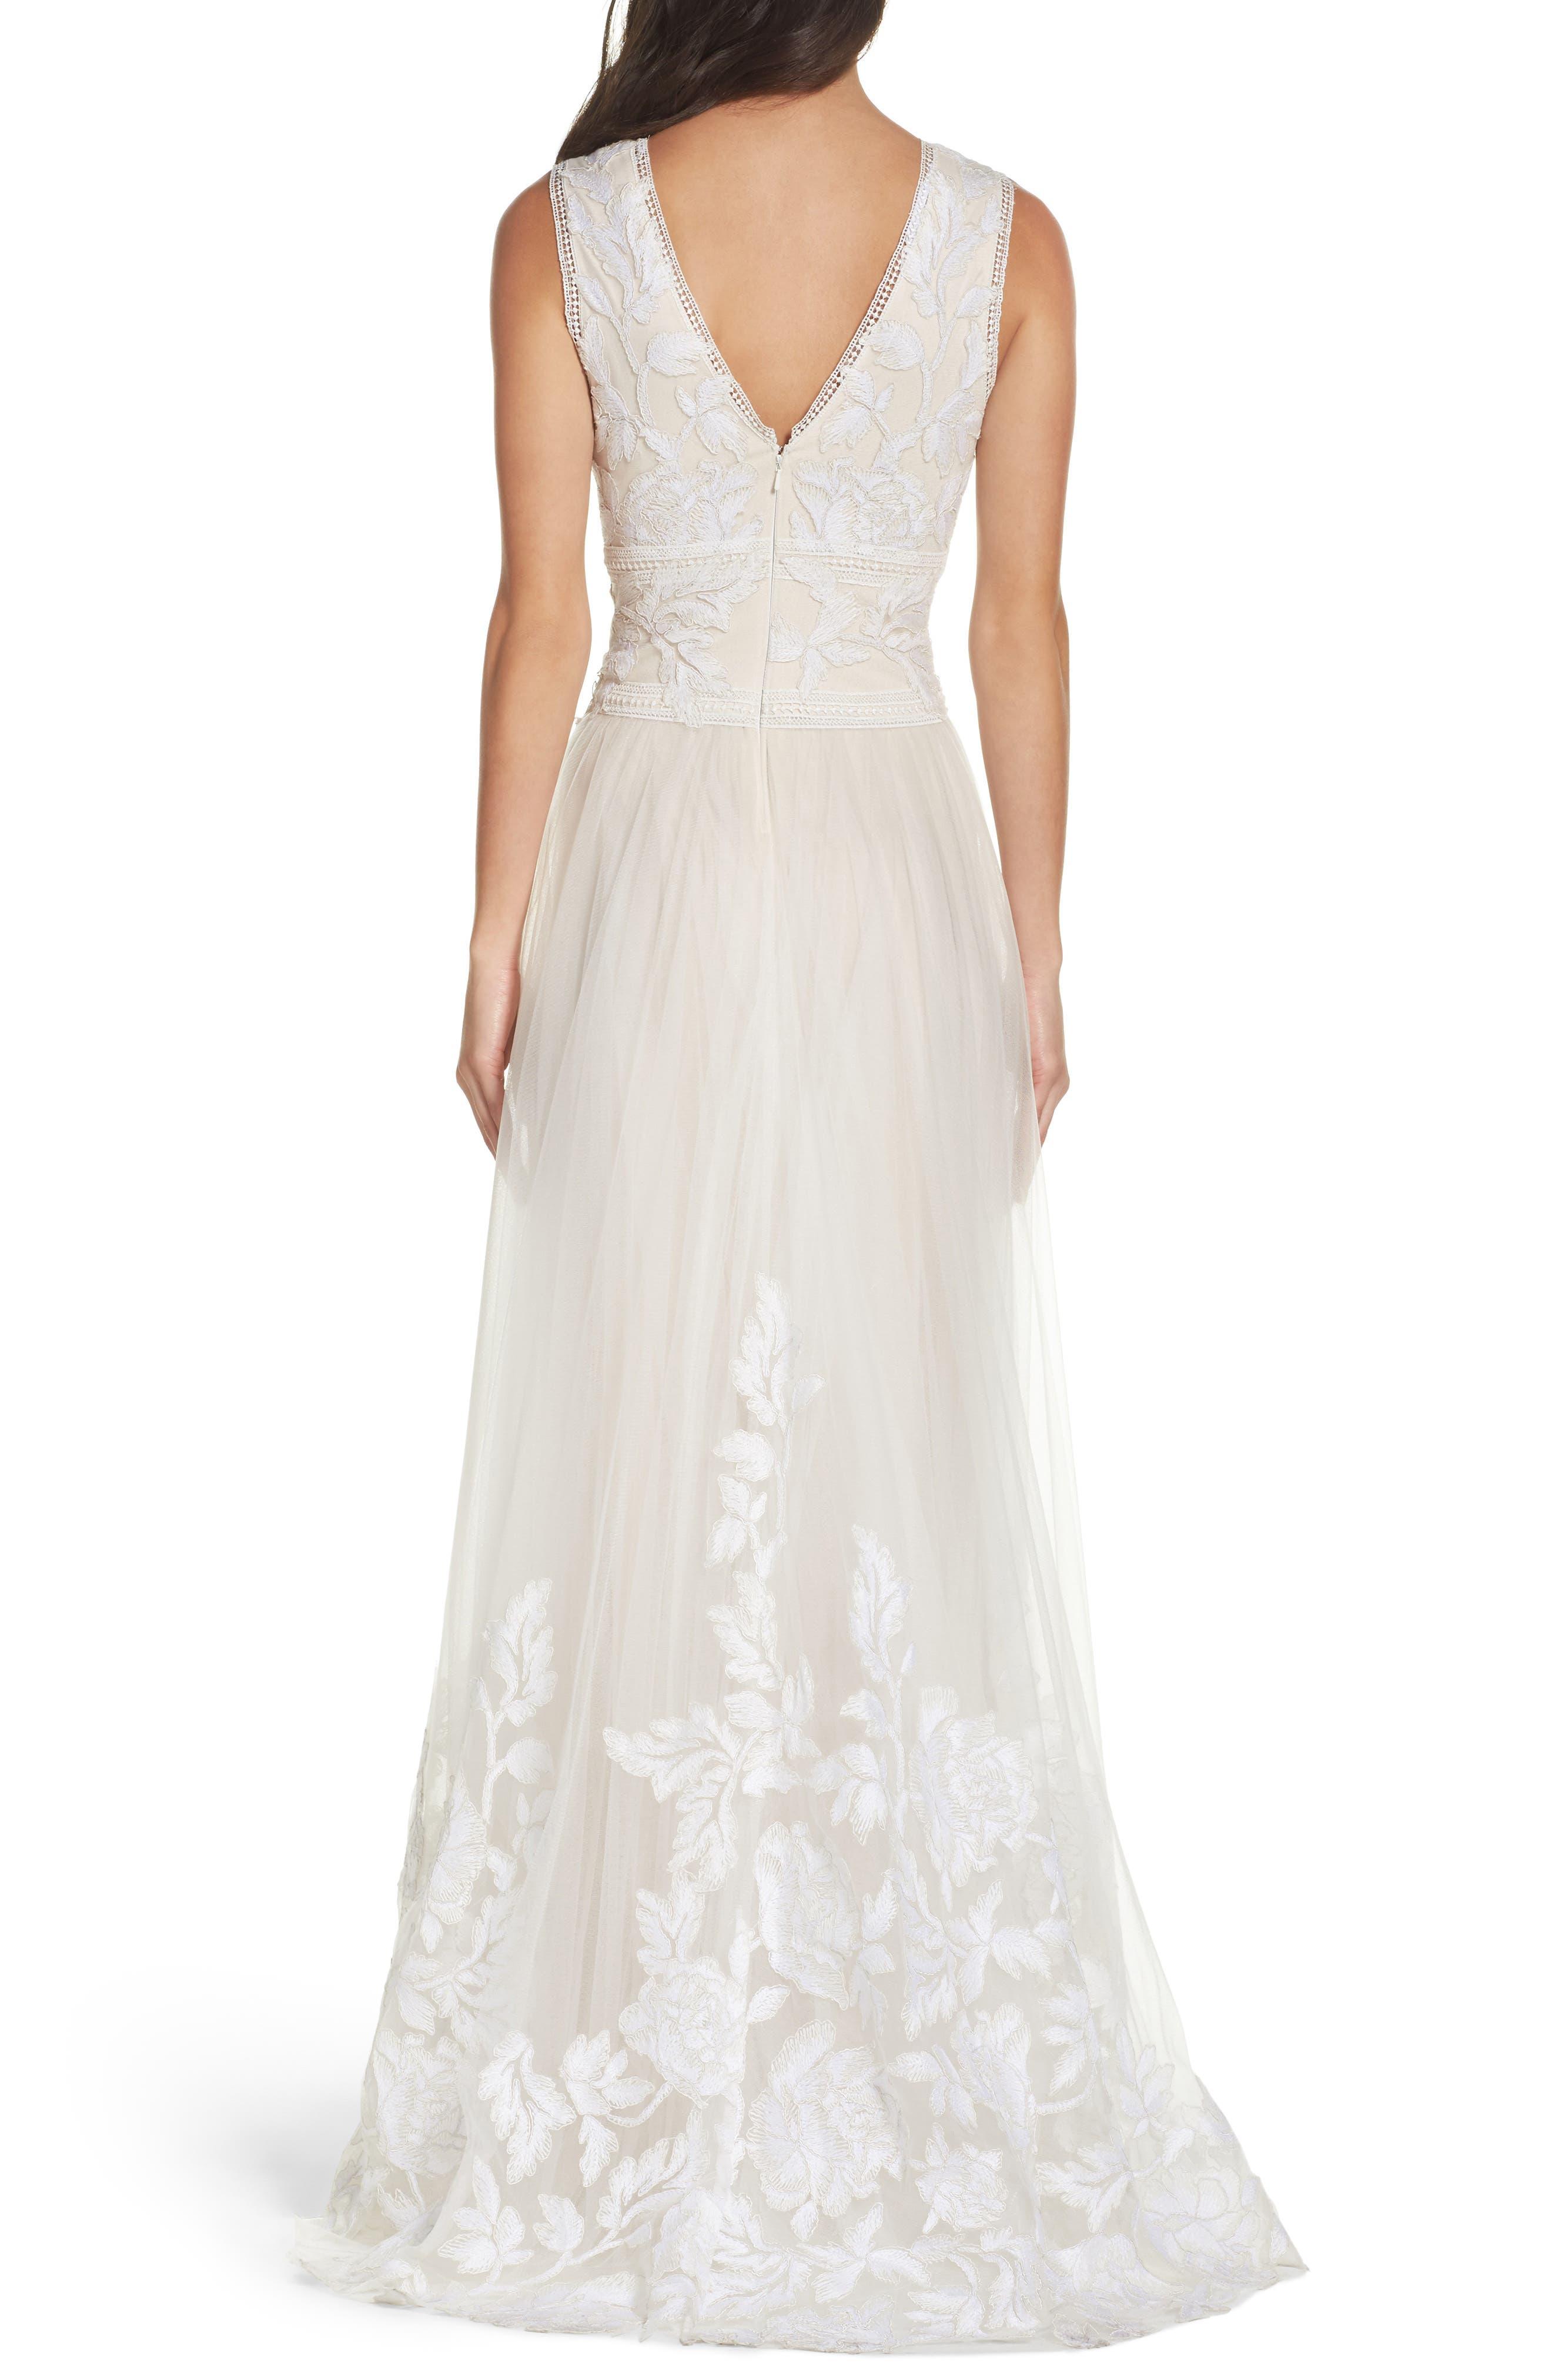 Tulle Lace A-Line Gown,                             Alternate thumbnail 2, color,                             Ivory/ Petal